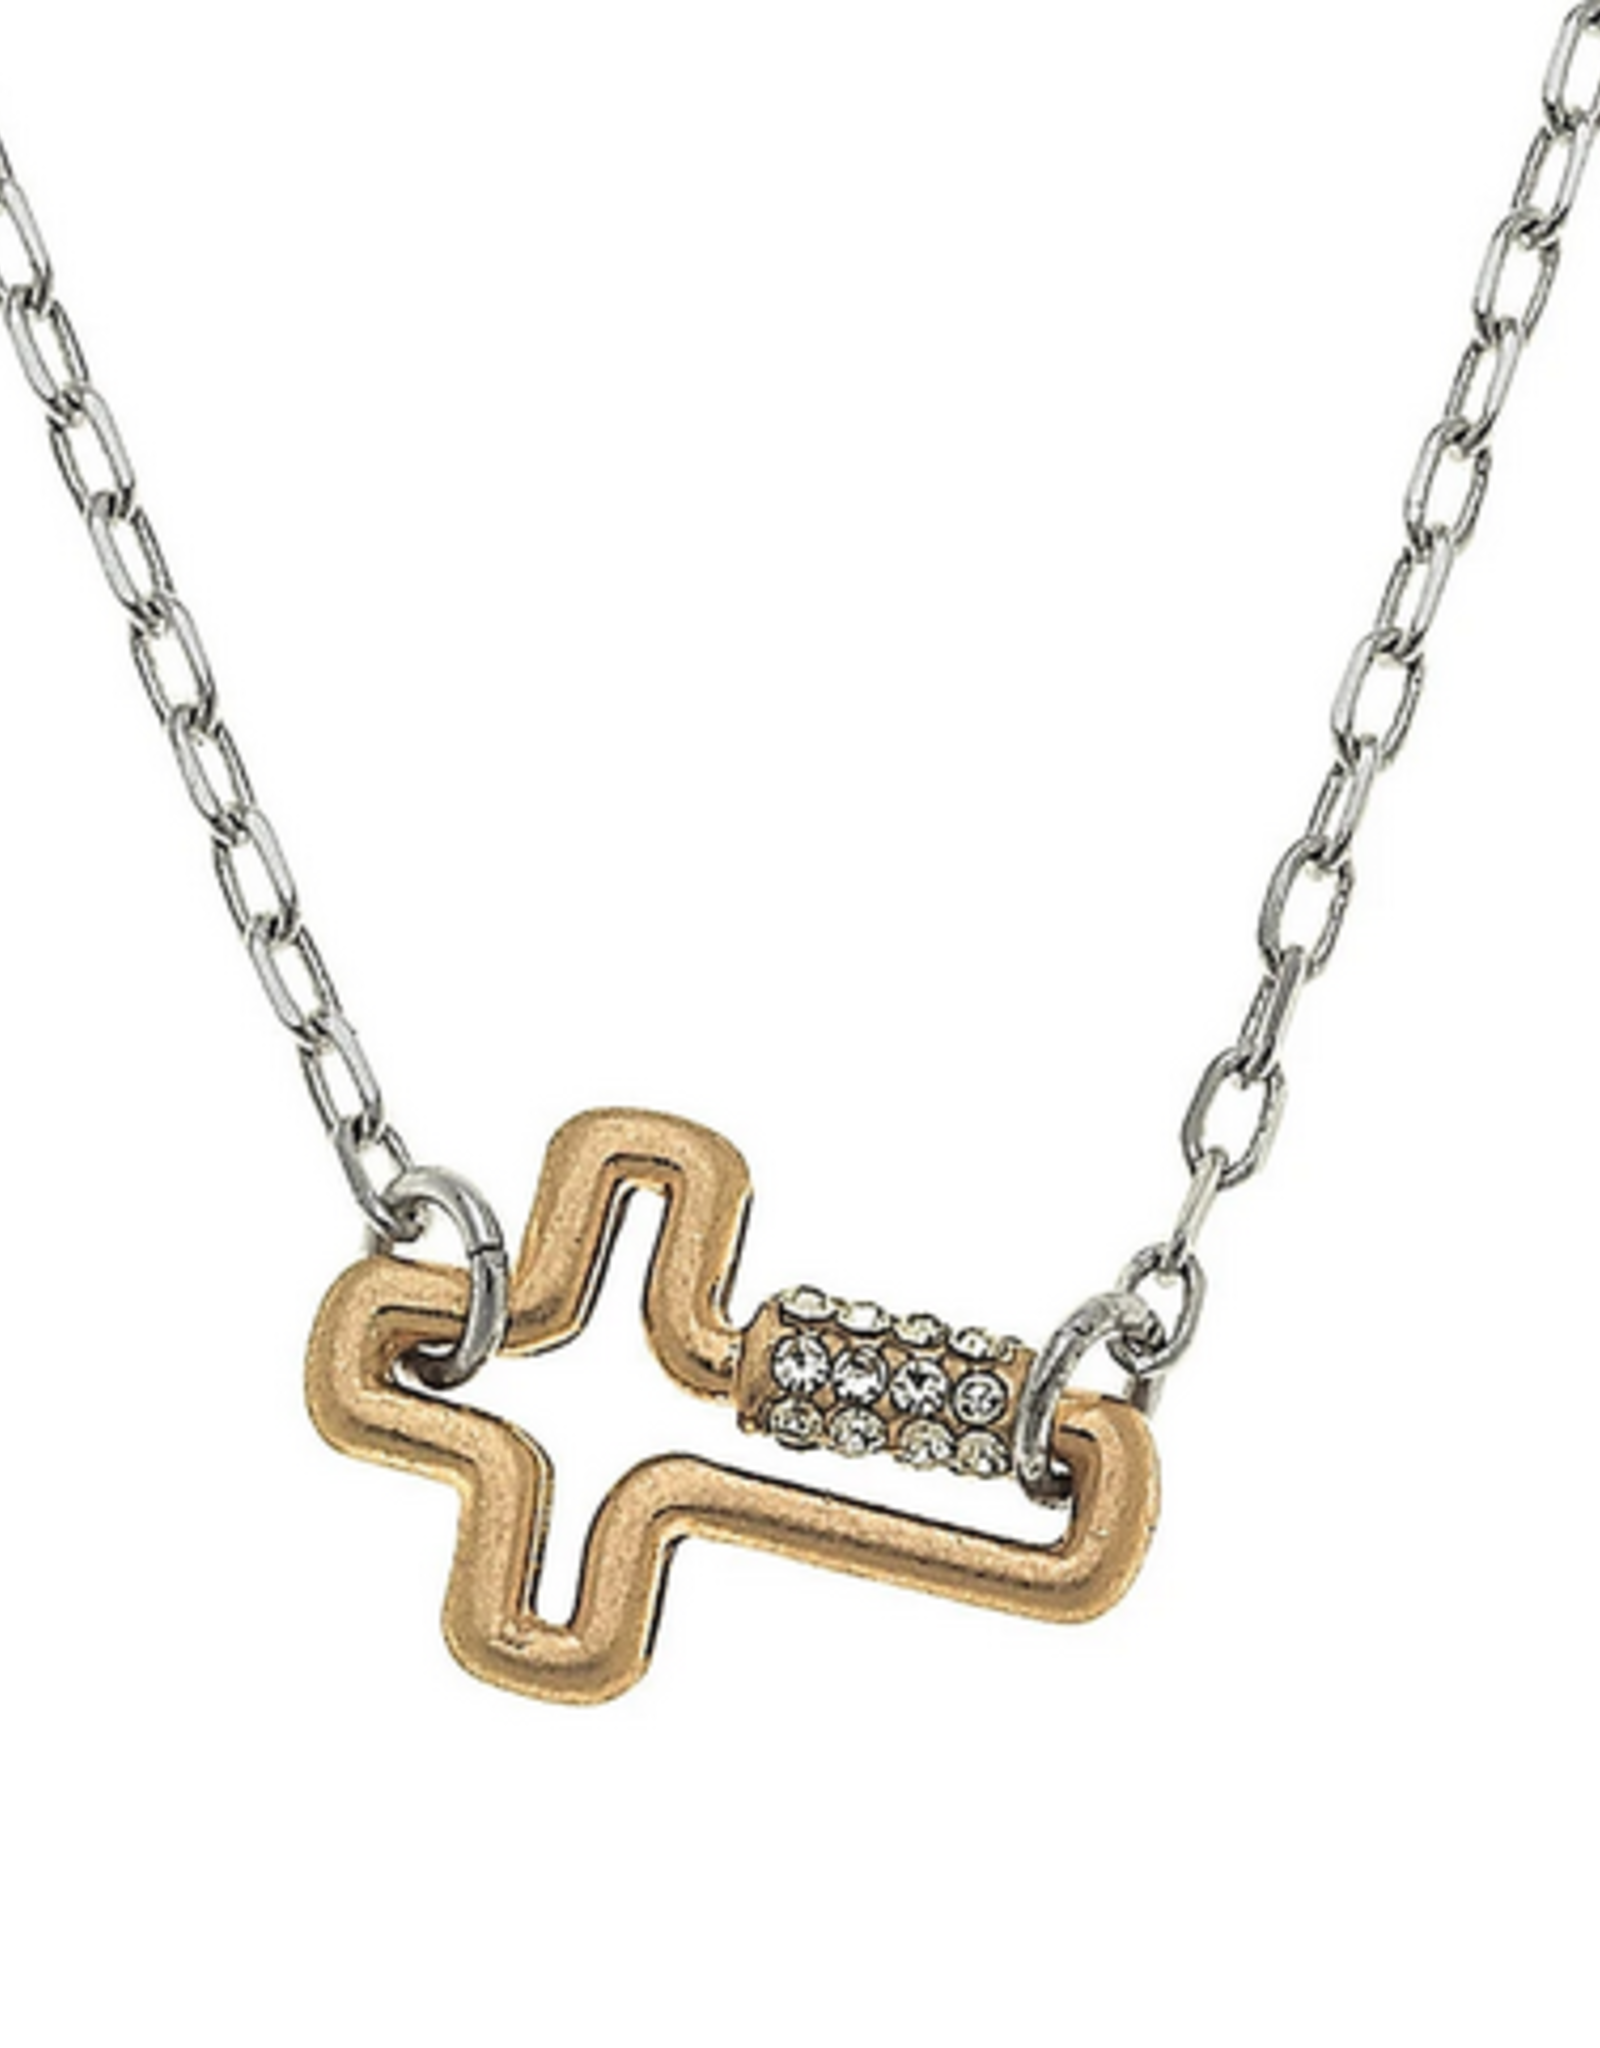 Mini Cross Lock Necklace 2 Tone